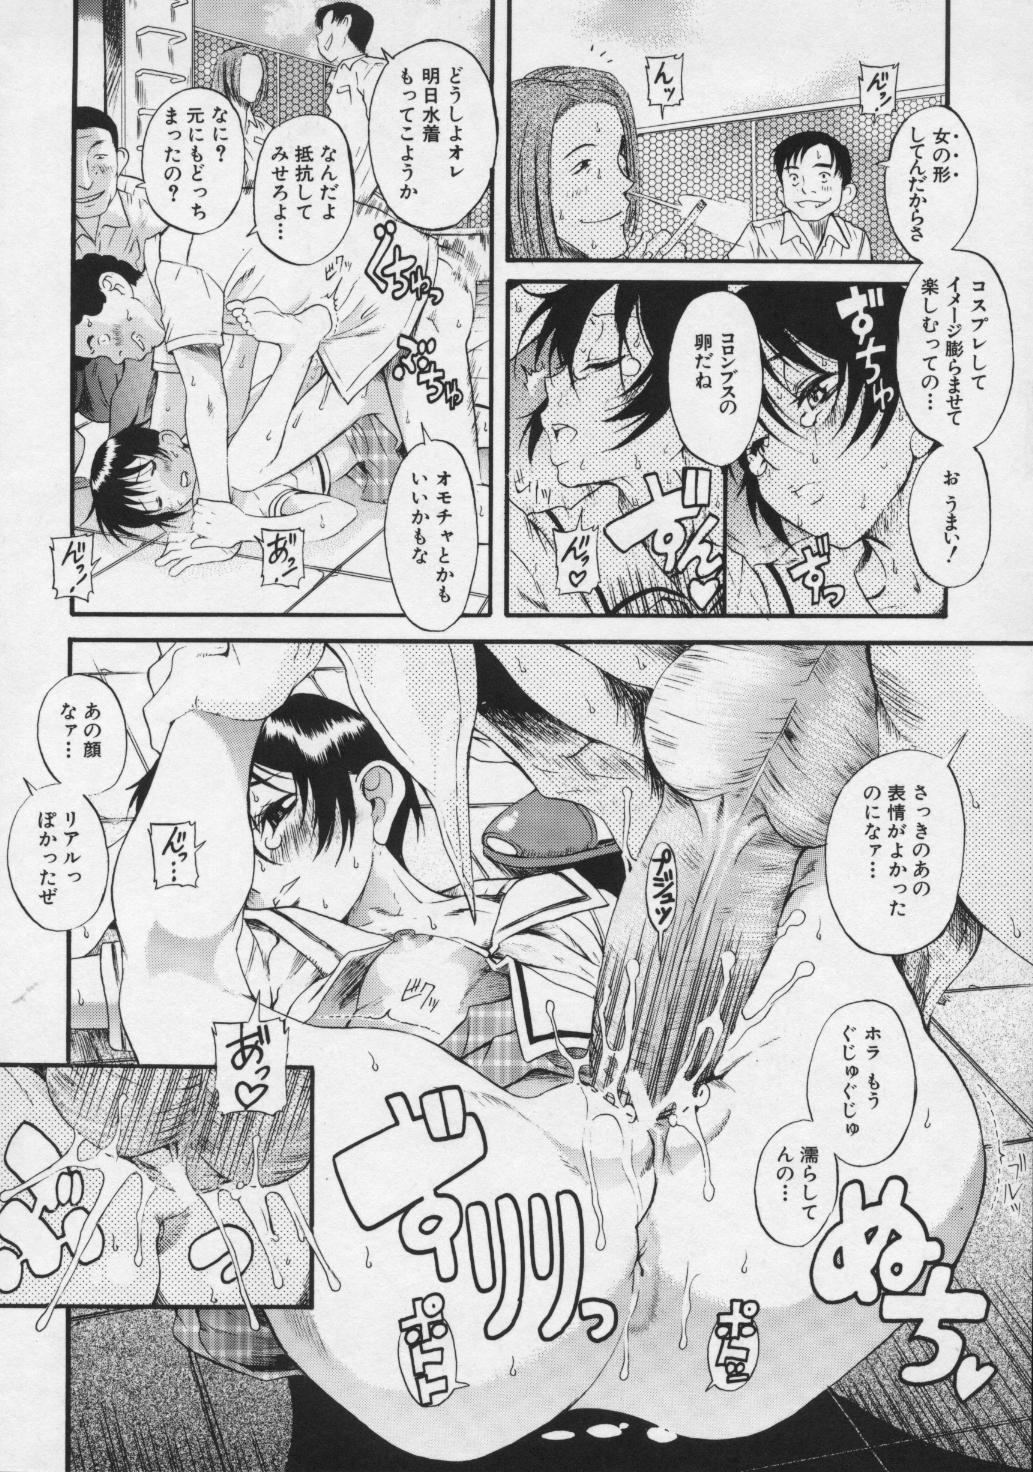 Kimi no Na o Yobeba - If I call your name. 71